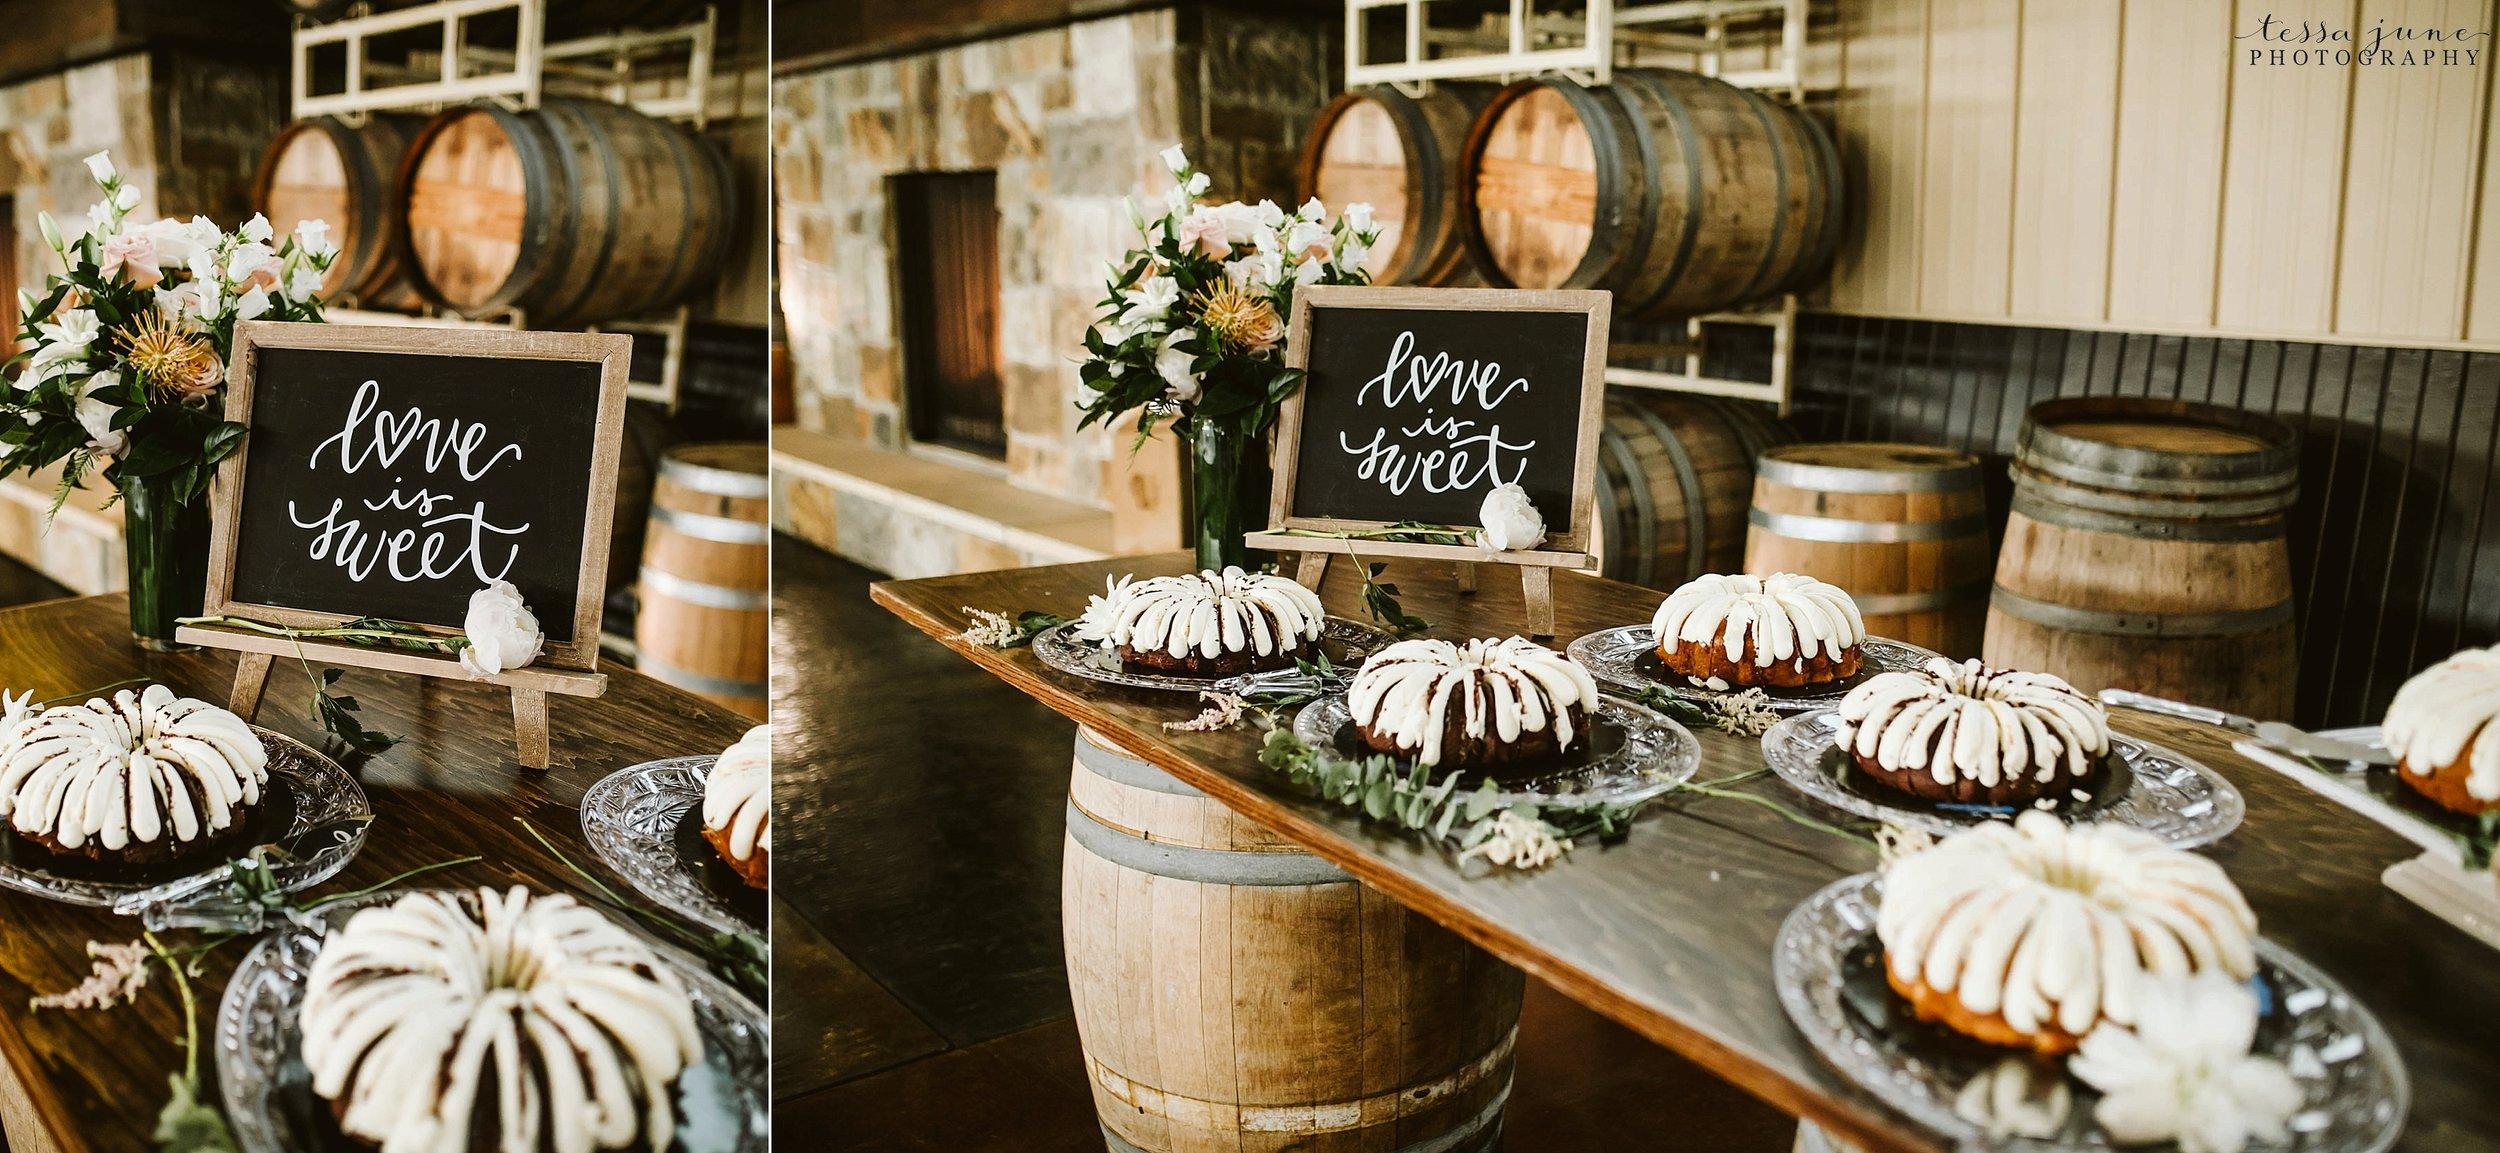 carlos-creek-winery-wedding-summer-pristine-floral-blush-pink-navy-alexandria-minnesota-142.jpg